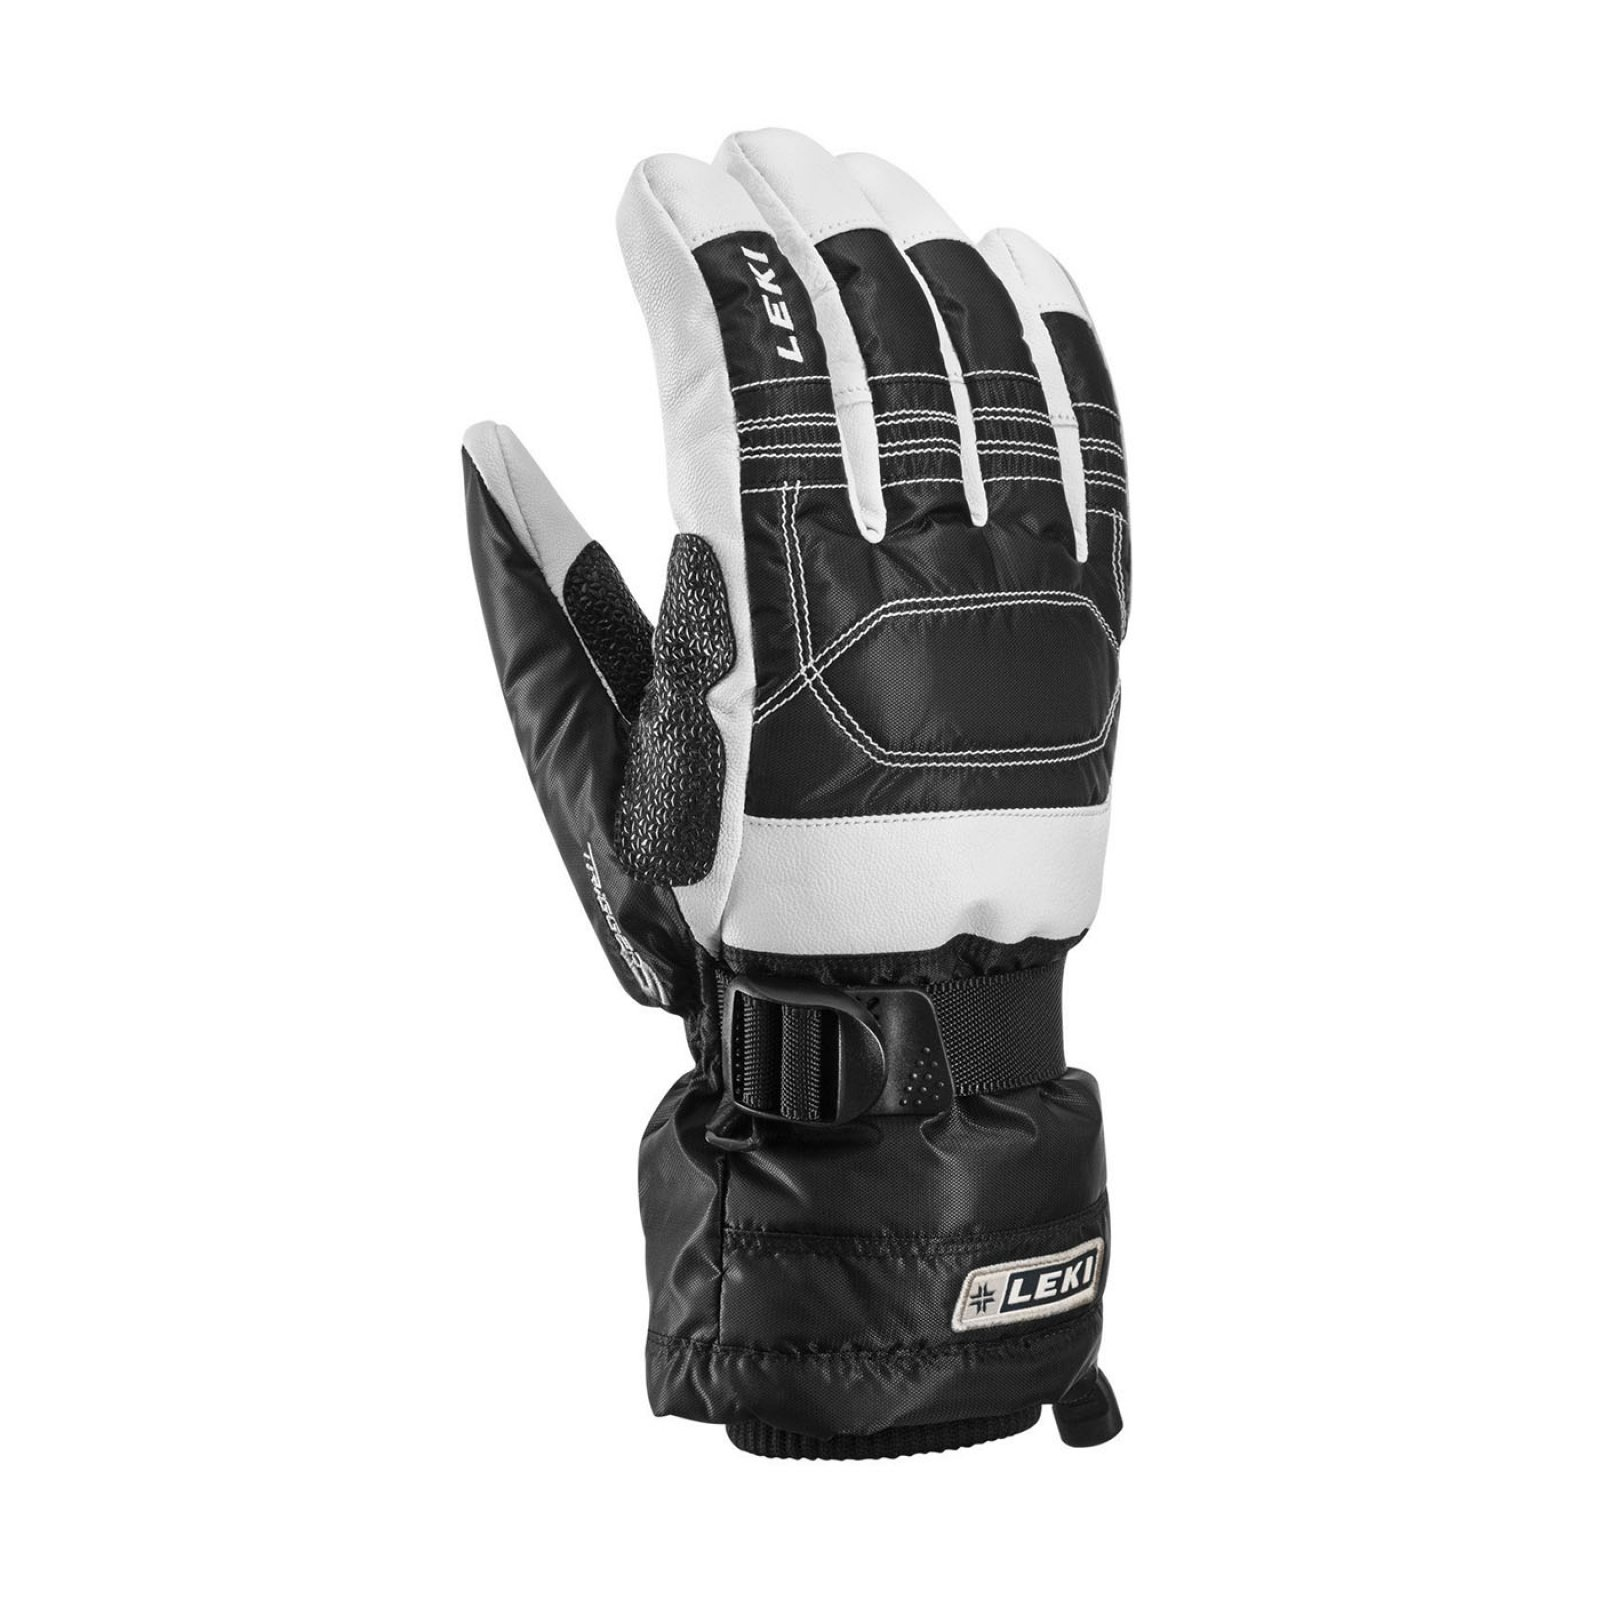 Lyžařské rukavice Leki Mountain Expedition S GTX - Actisport.cz 88a7f81c89